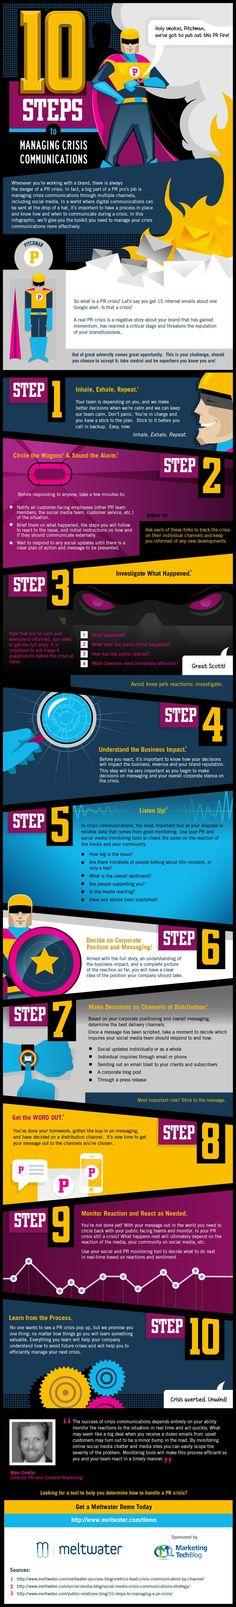 10 Step Crisis Management Plan